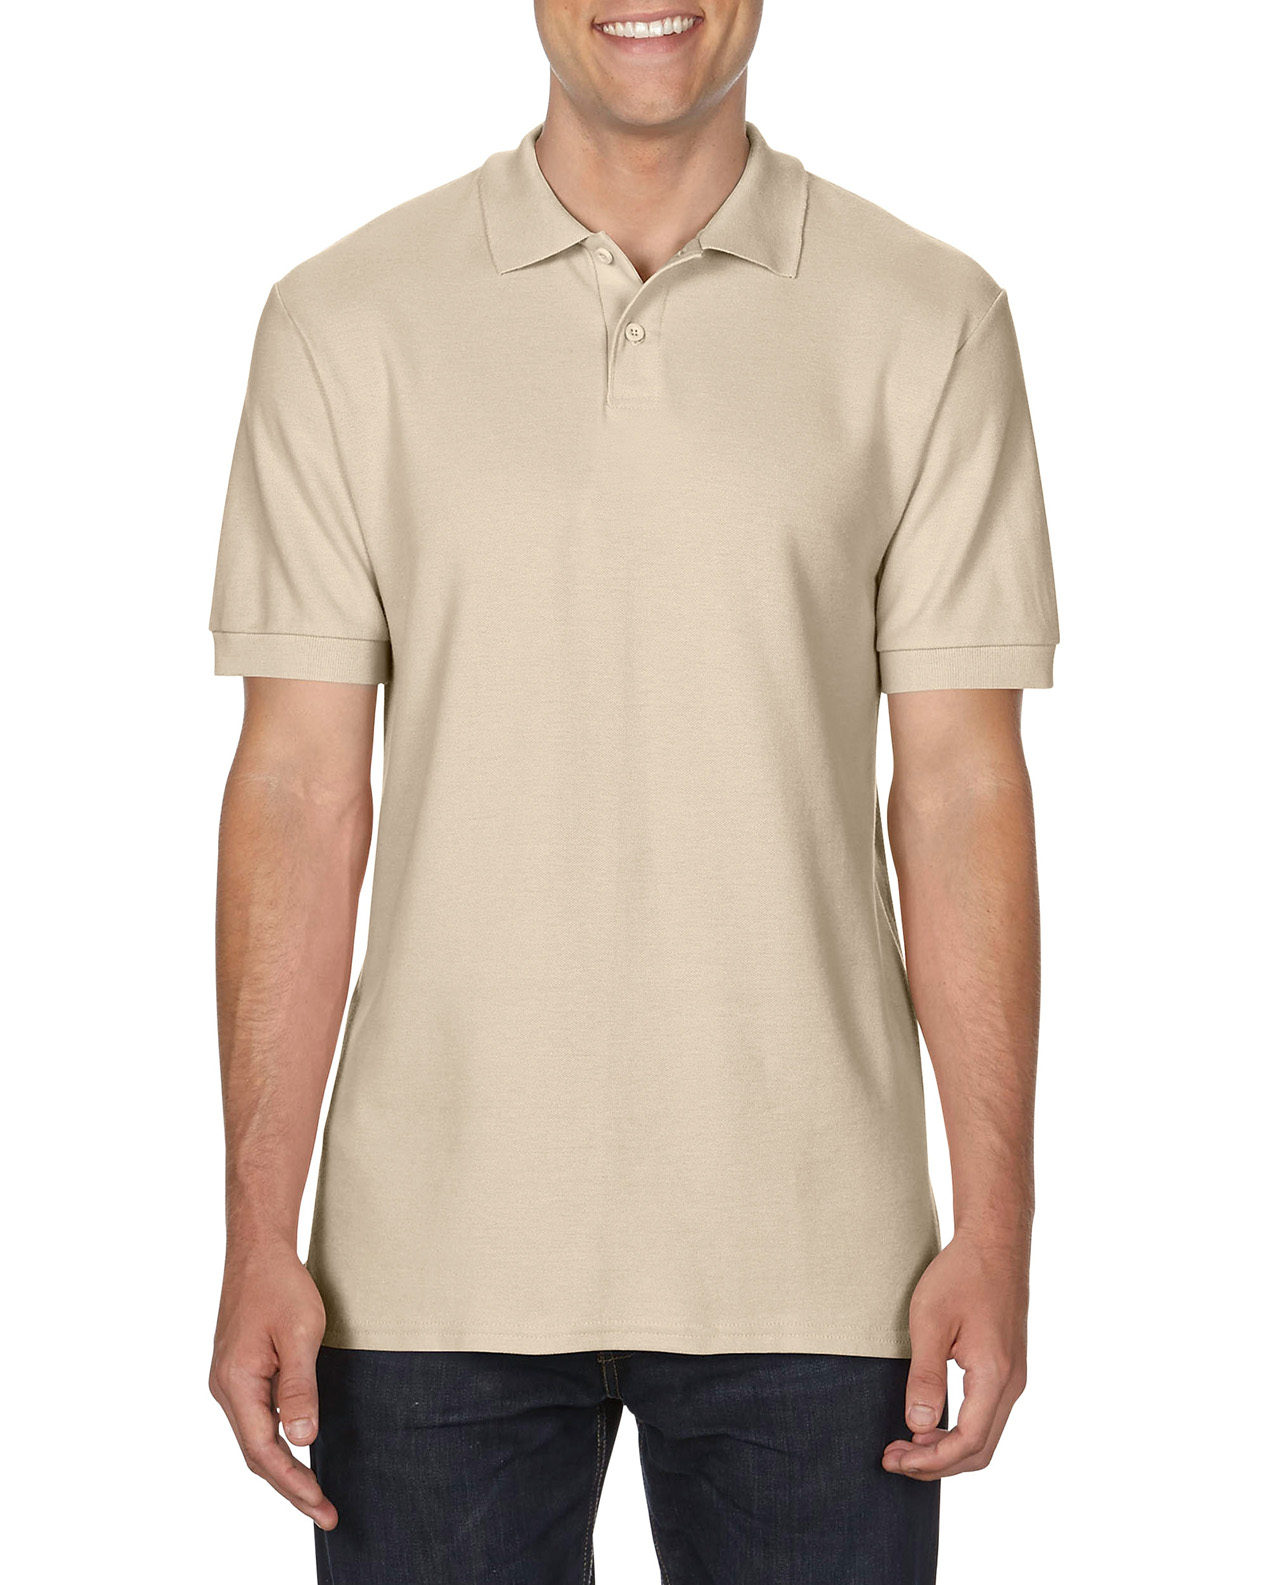 100 cotton Gildan polo shirt sand